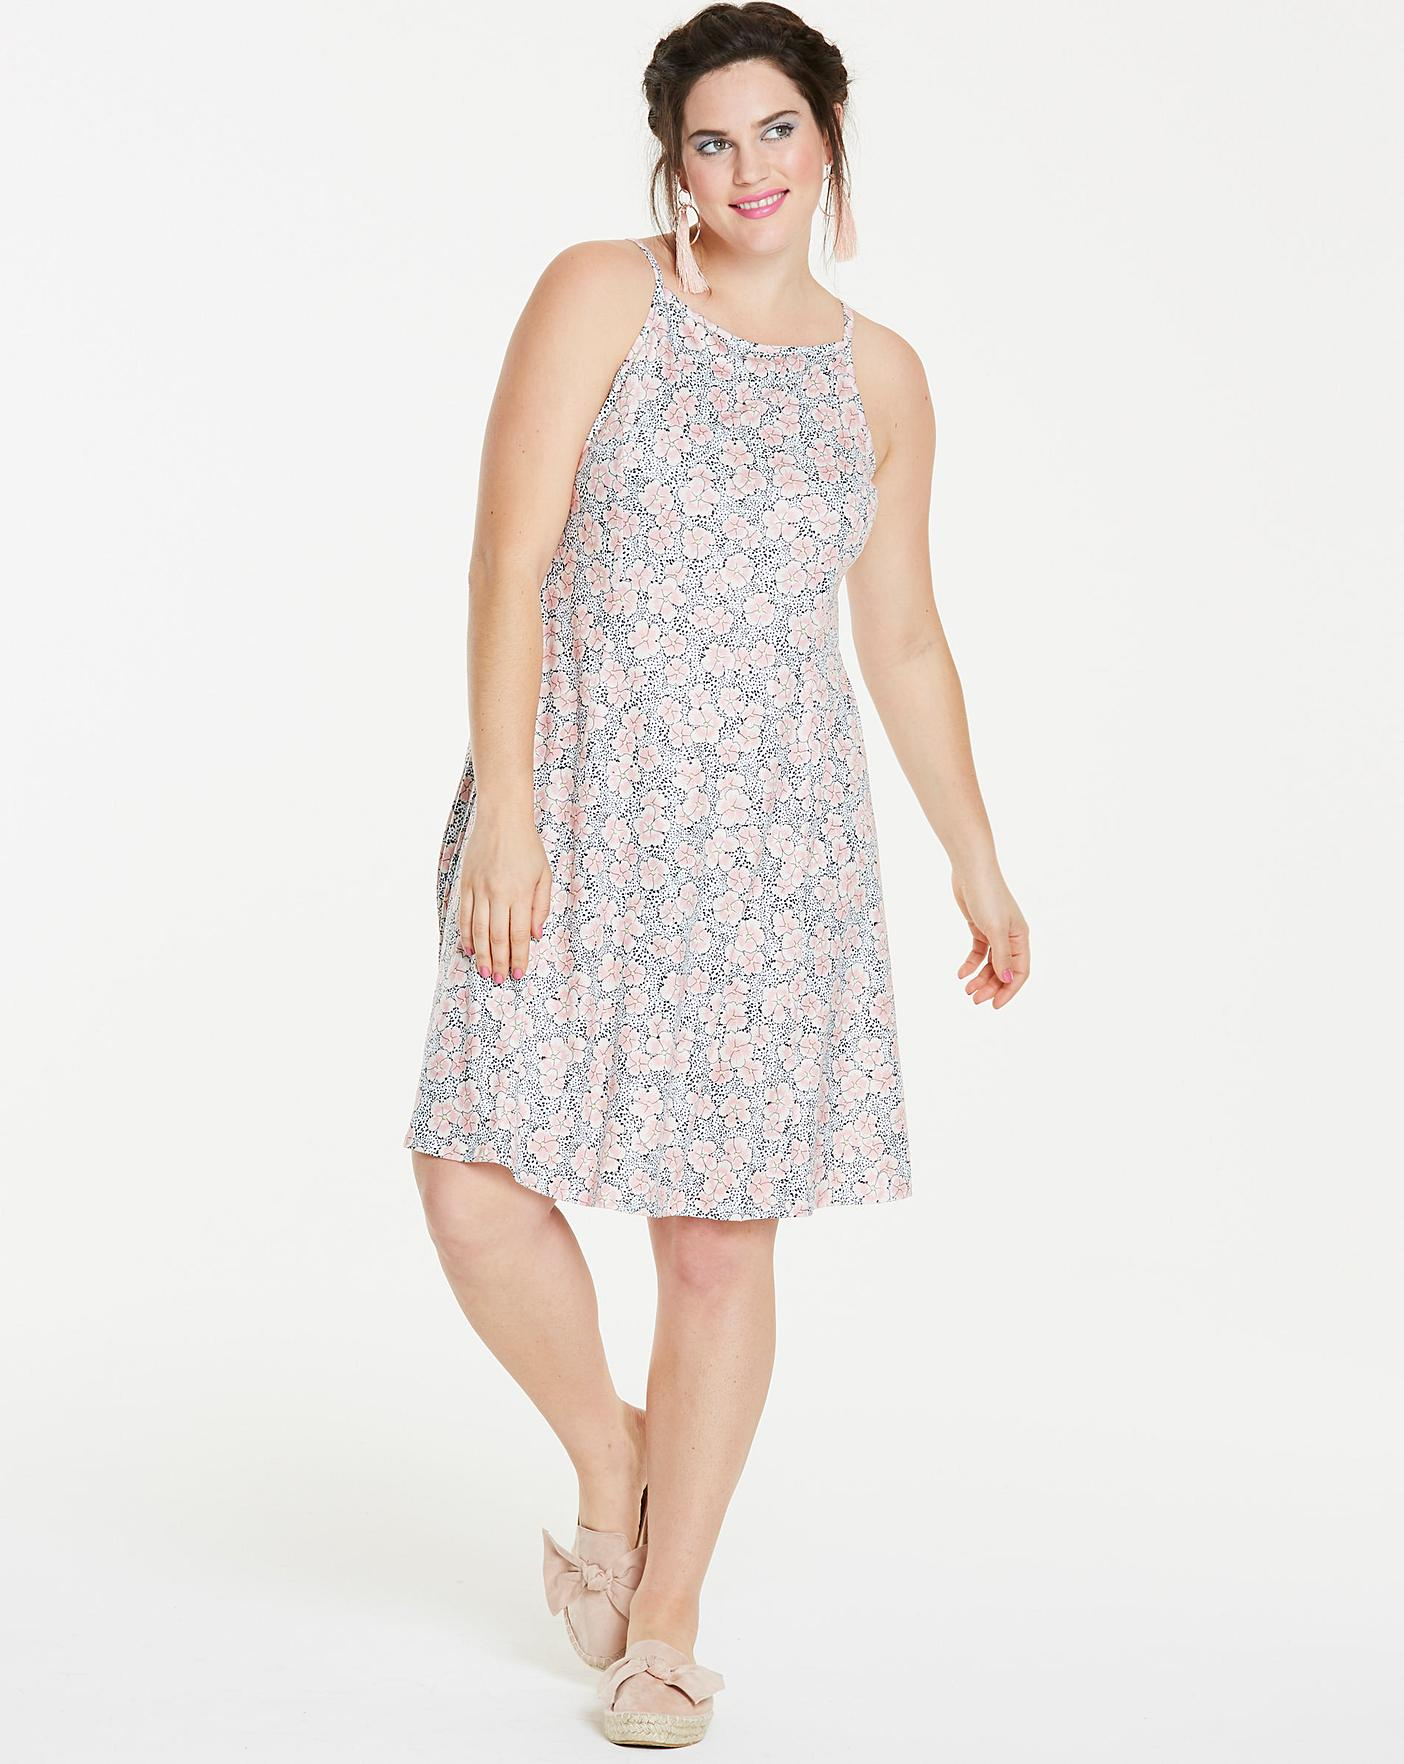 0f046aebe428 Jersey Skater Dress